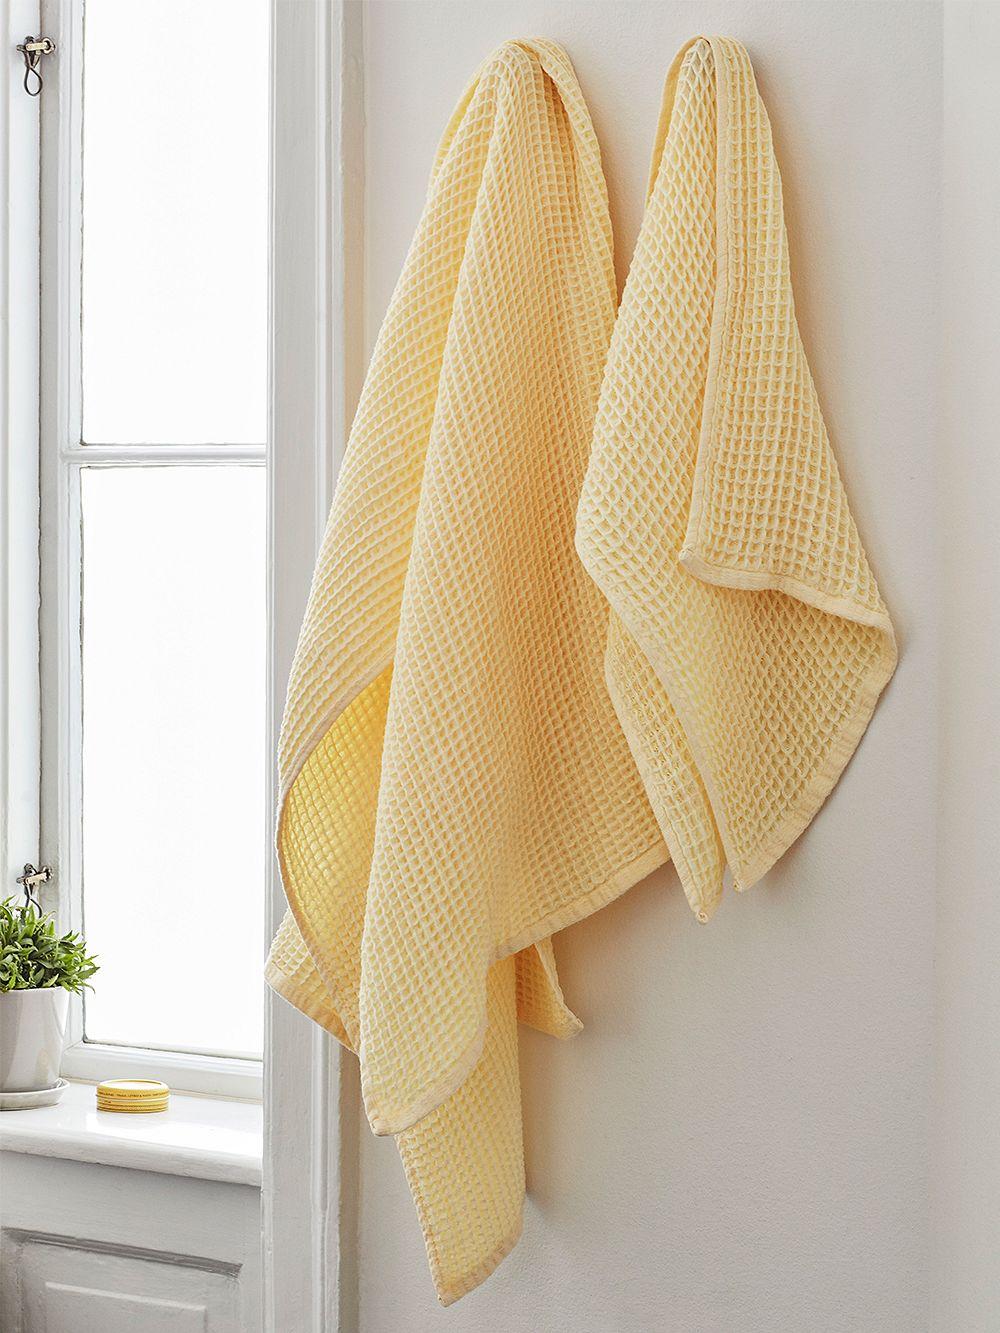 HAY Giant Waffle bath towel, soft yellow